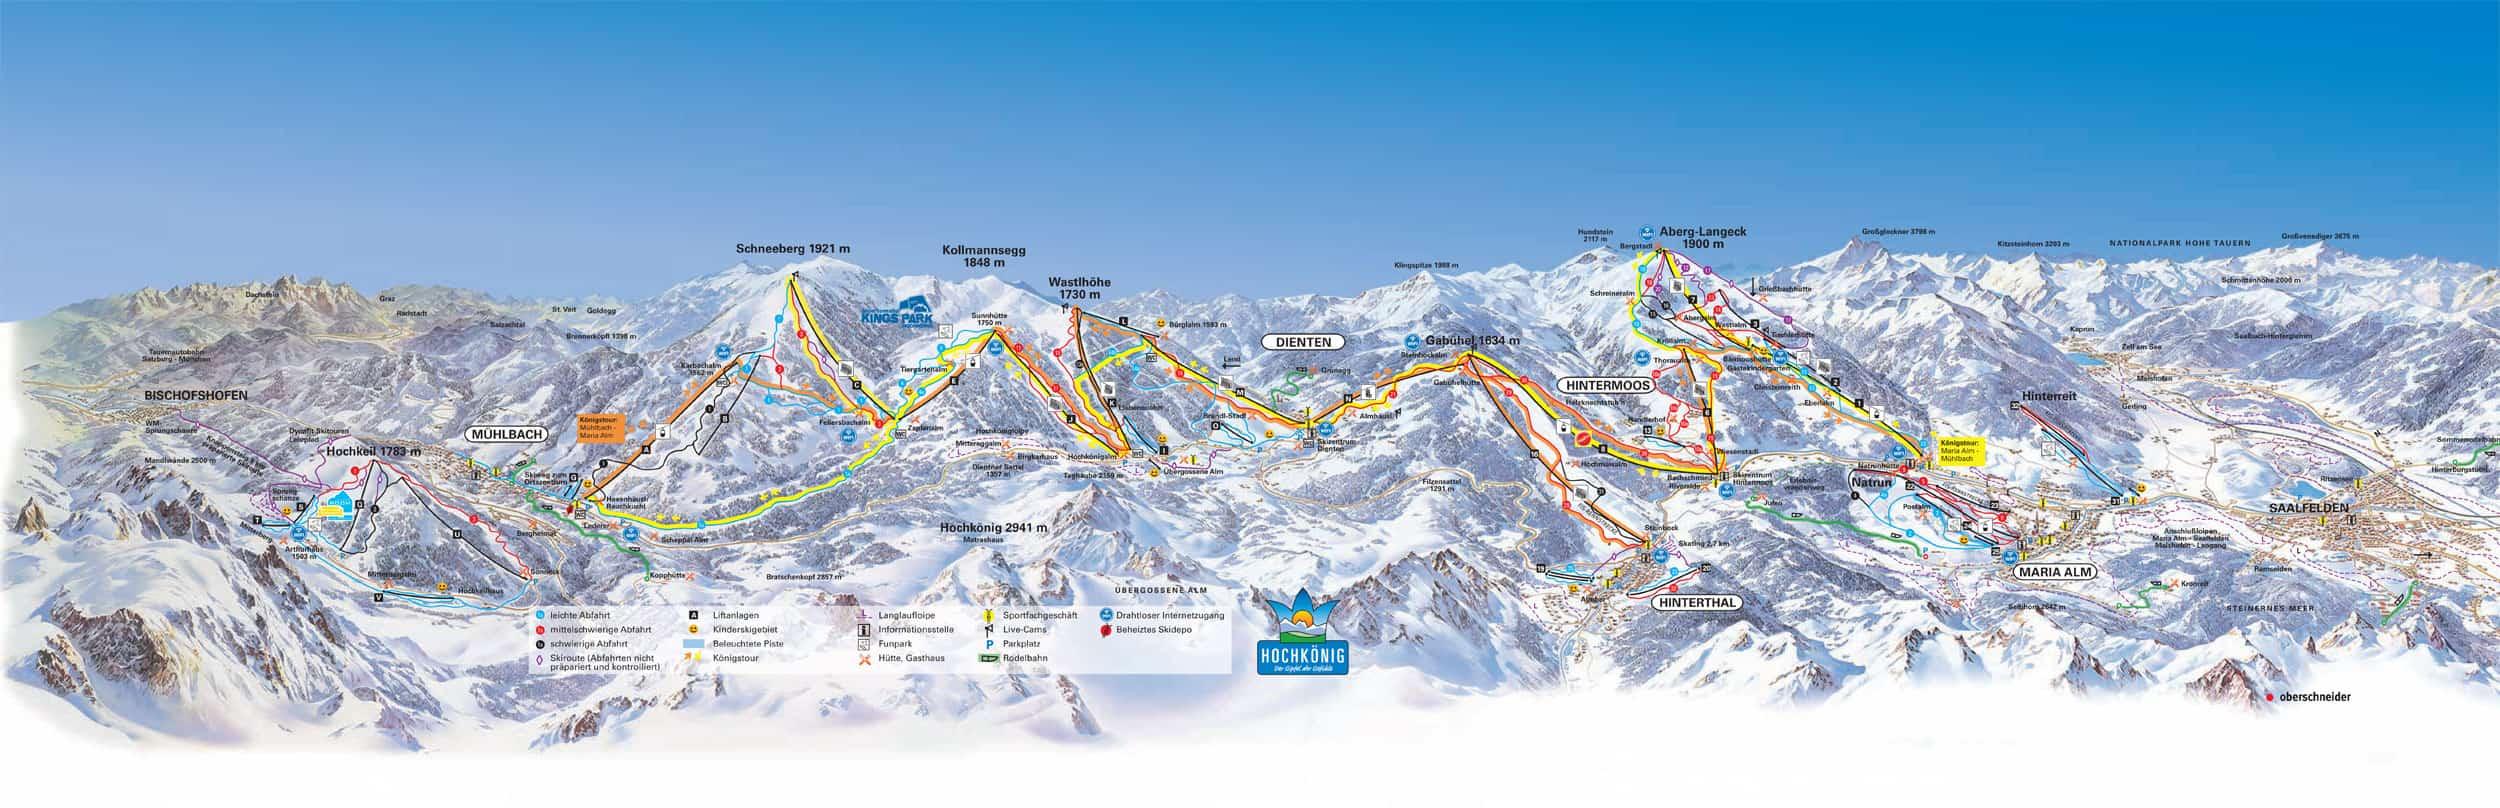 Skipiste kaart van het Hochkönig skigebied